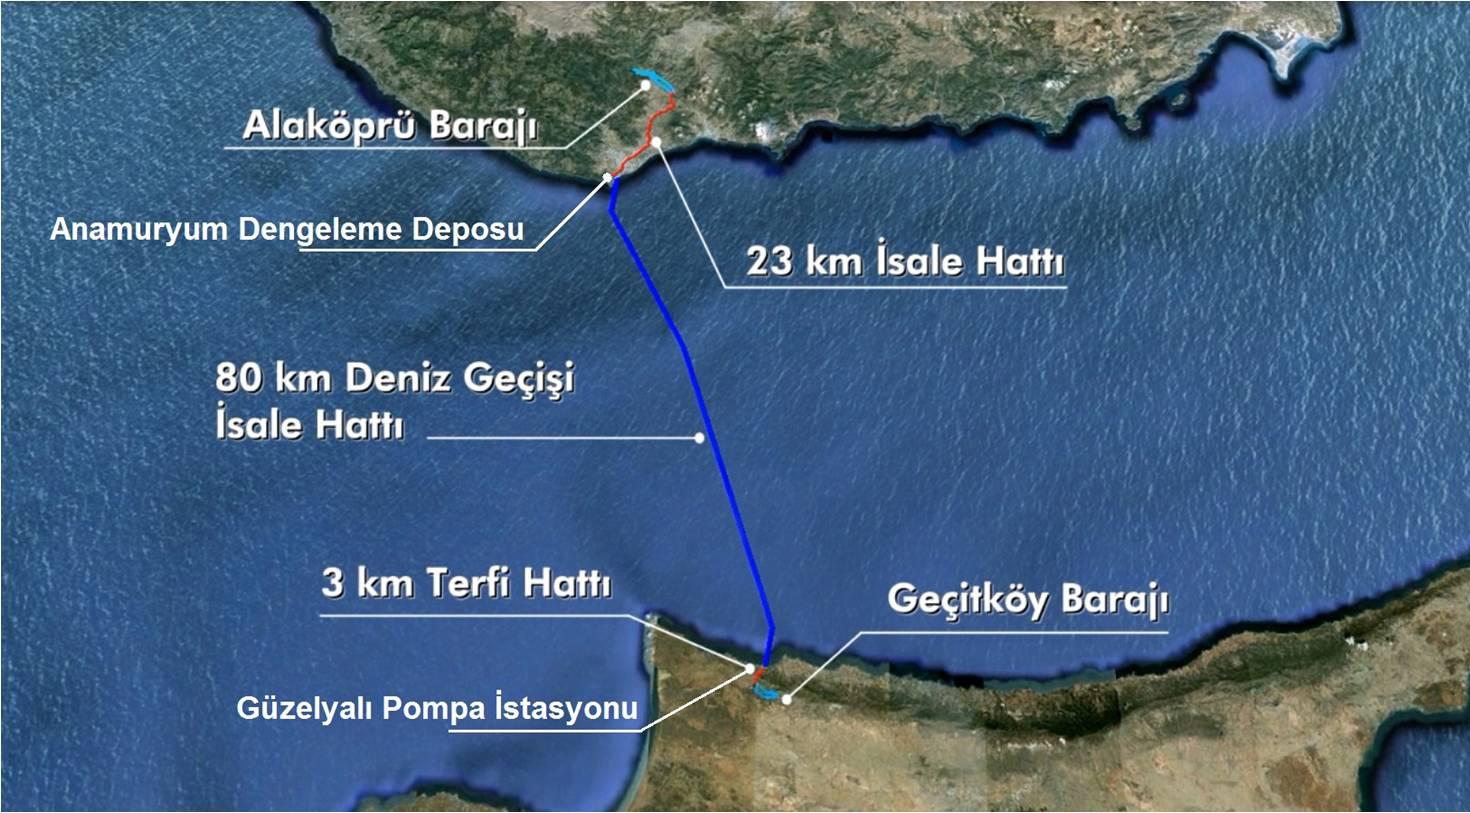 Kıbrıs'ta AKP'nin su rantı kavgası